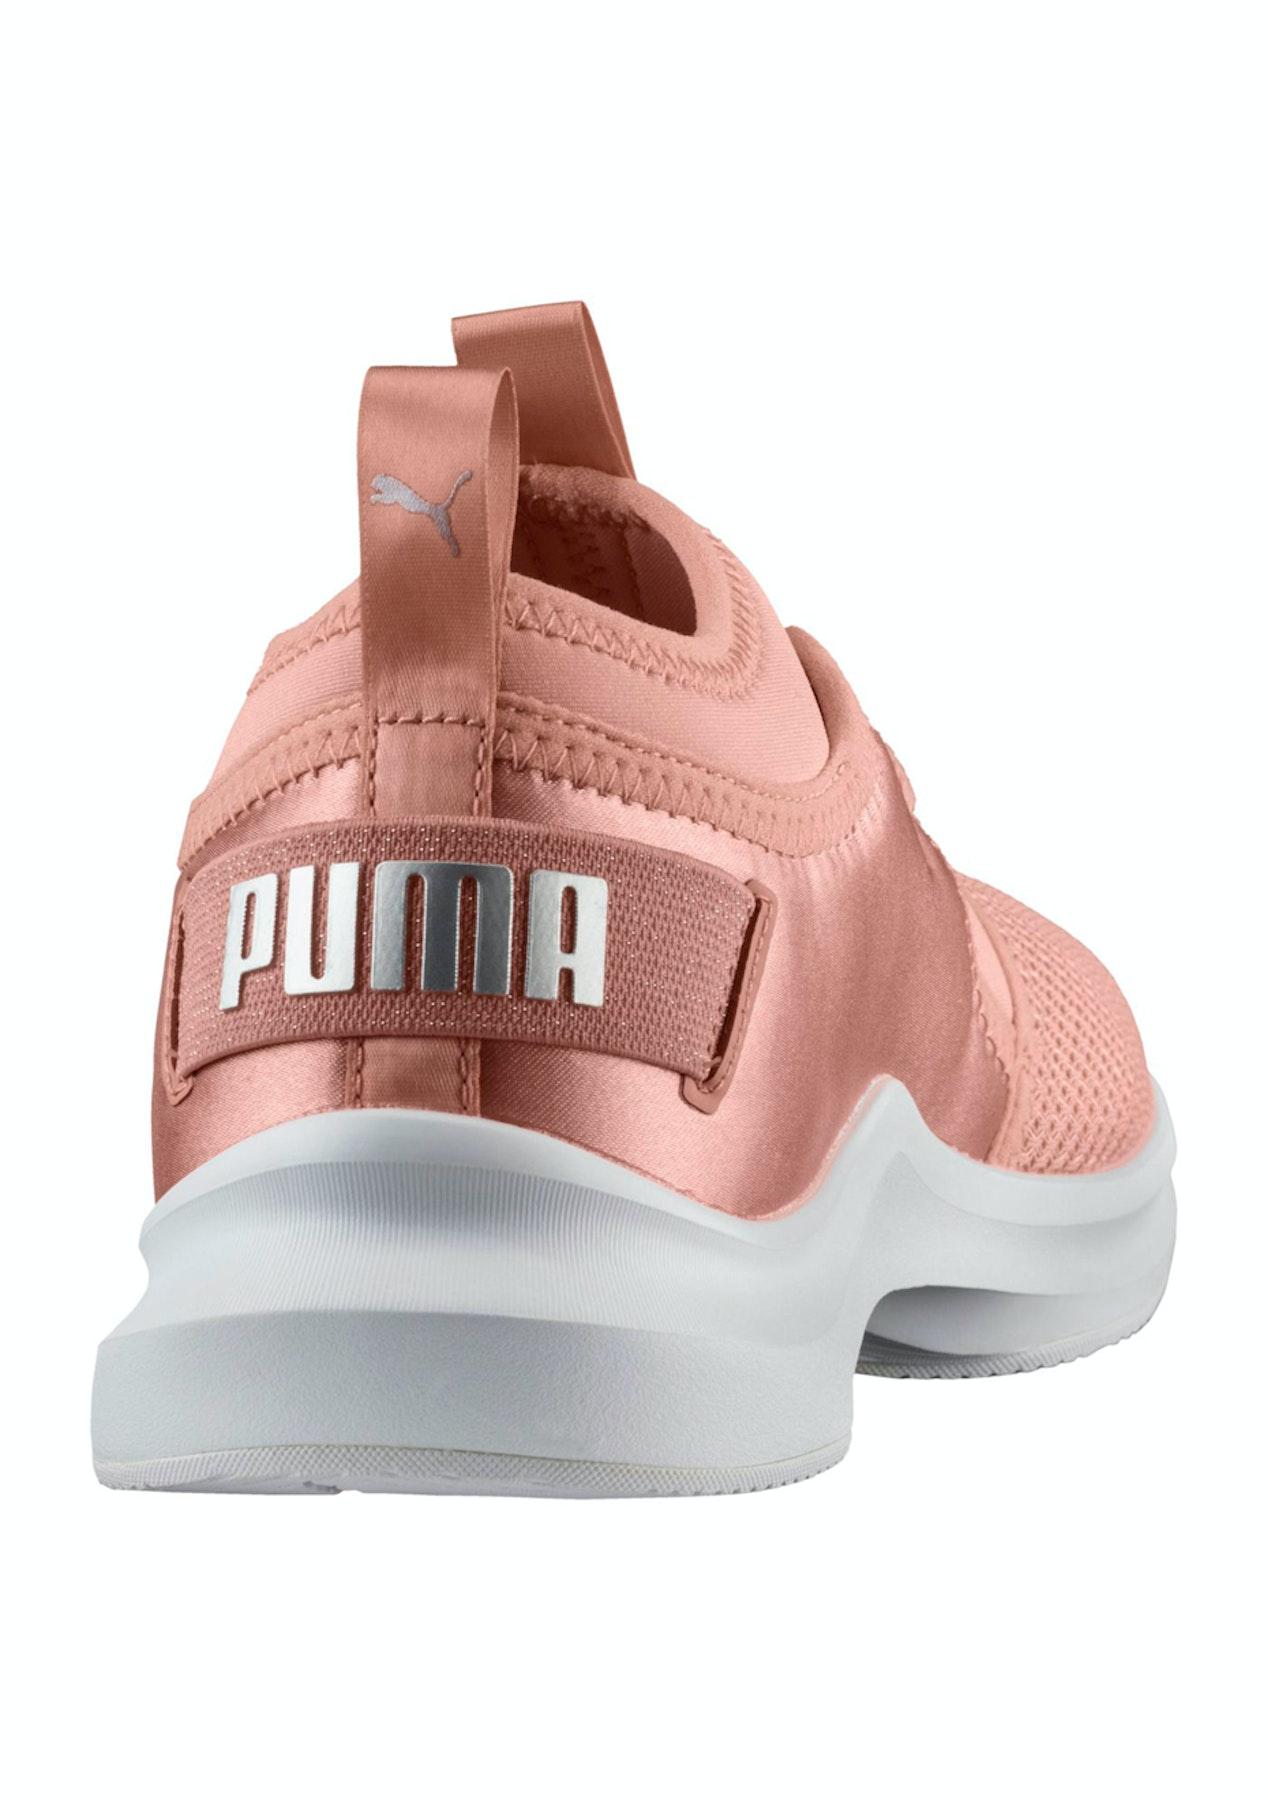 dbcaf6a266b Puma Womens - Phenom Low Satin Ep - Peach - Puma Womens   Kids up to 63%  Off - Onceit